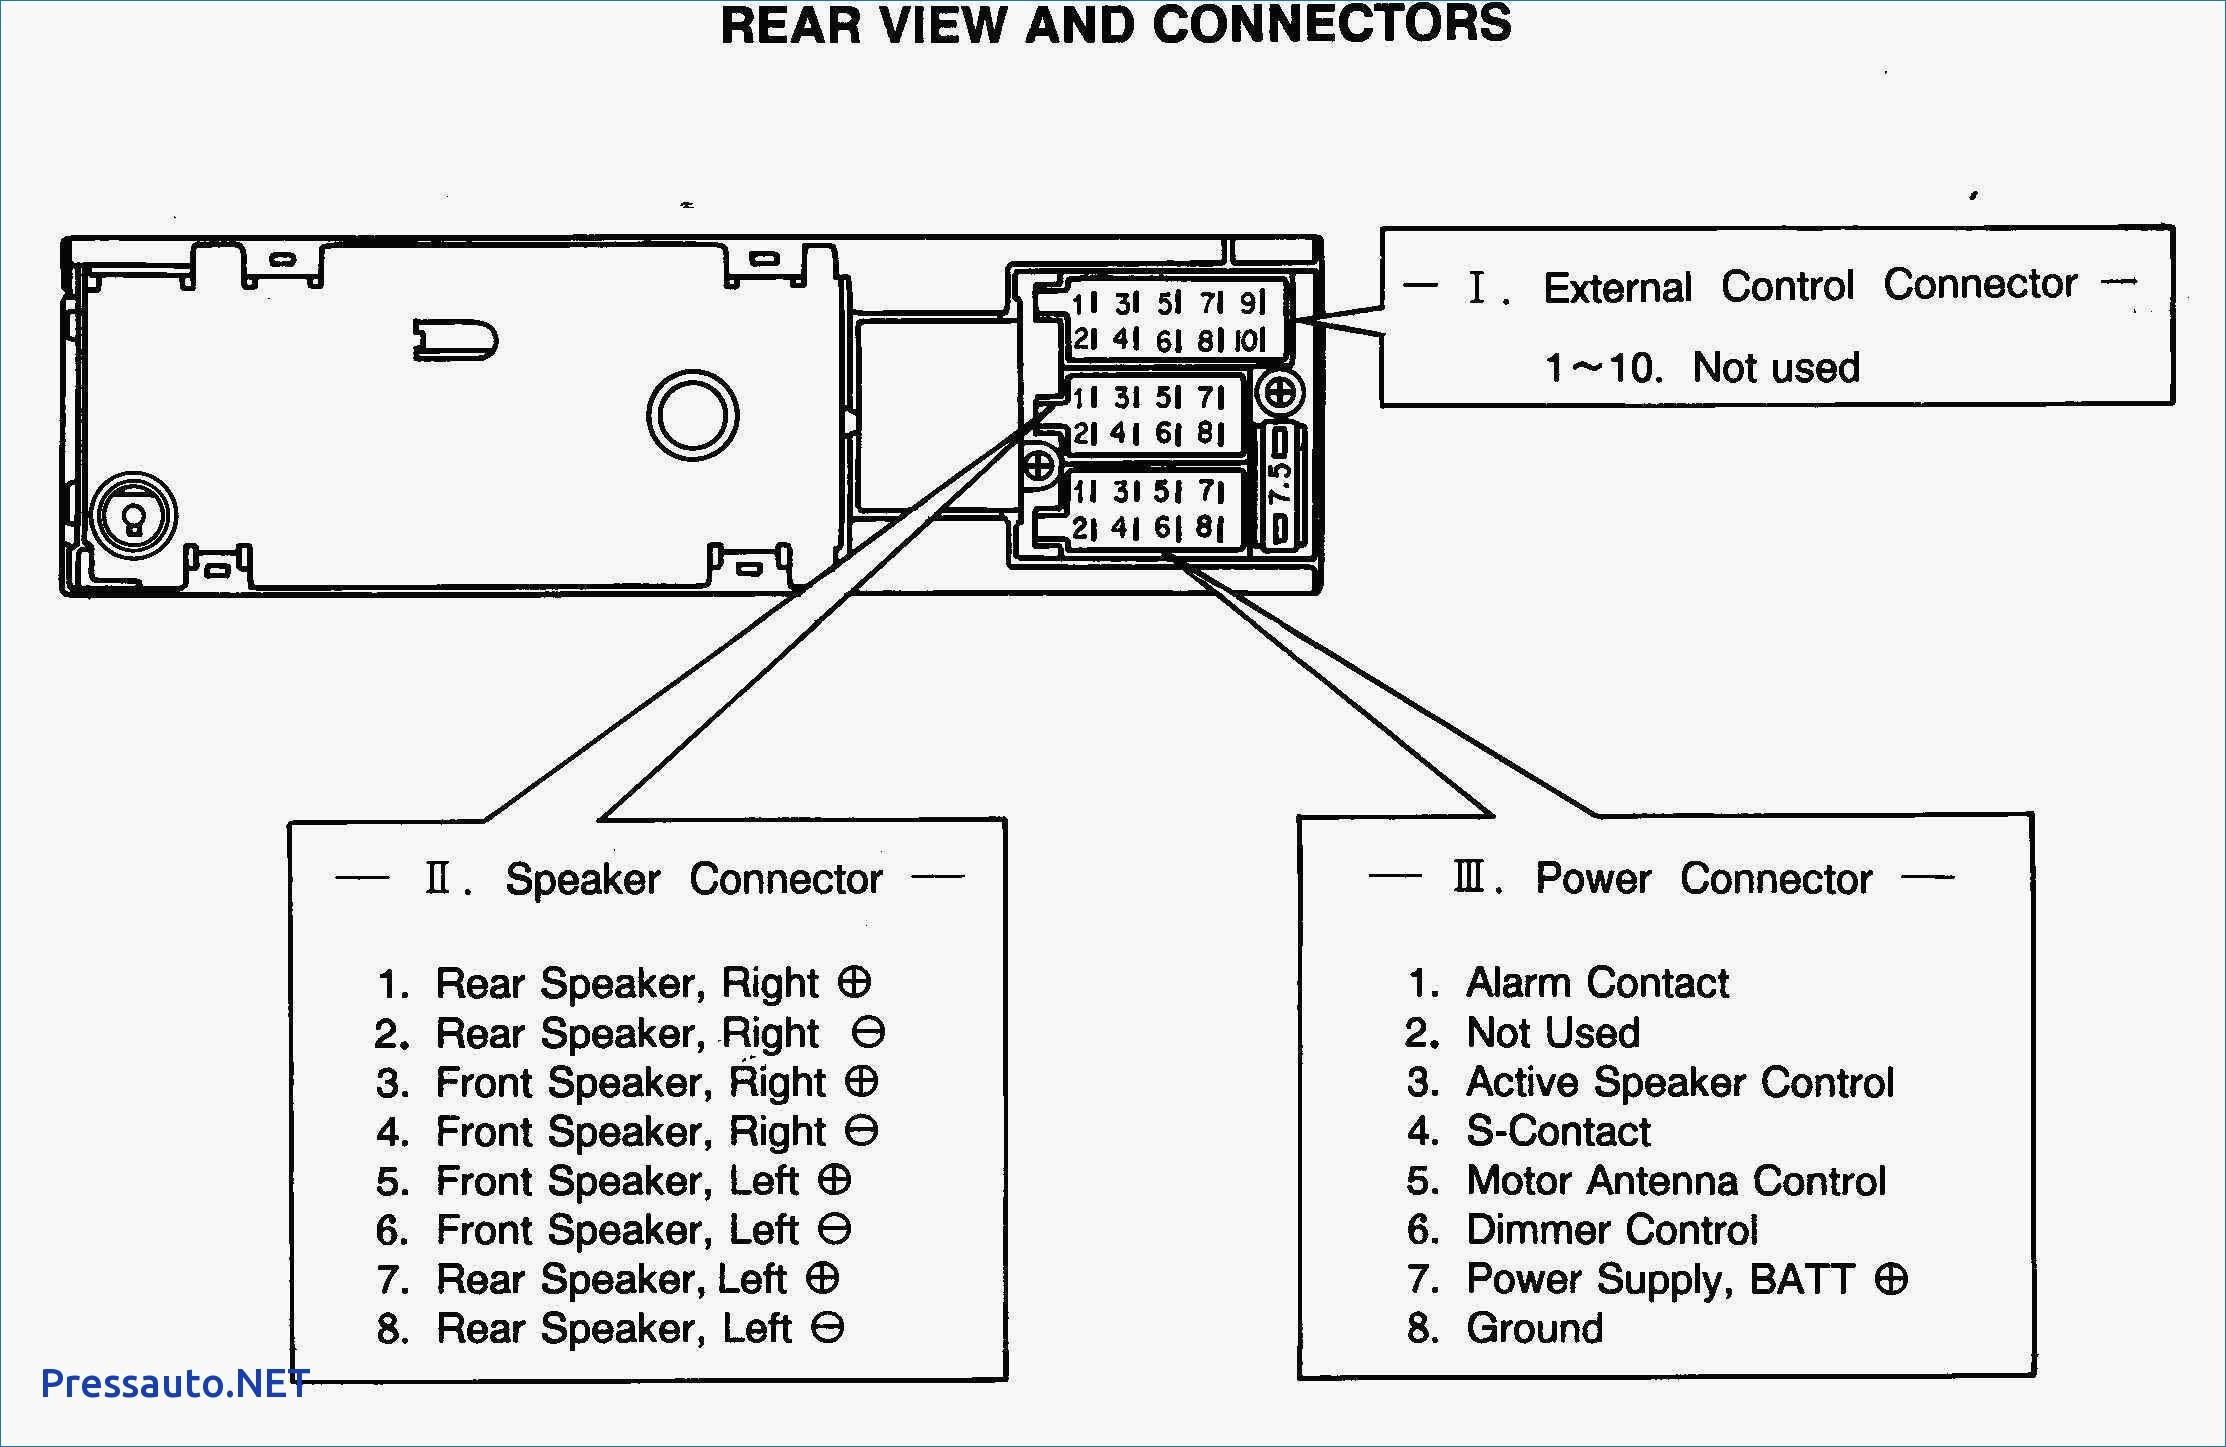 Wiring Diagram Kenwood Car Radio Wiring Diagram Jeep Grand Cherokee Wj  Pioneer Fh X700bt Harness 1997